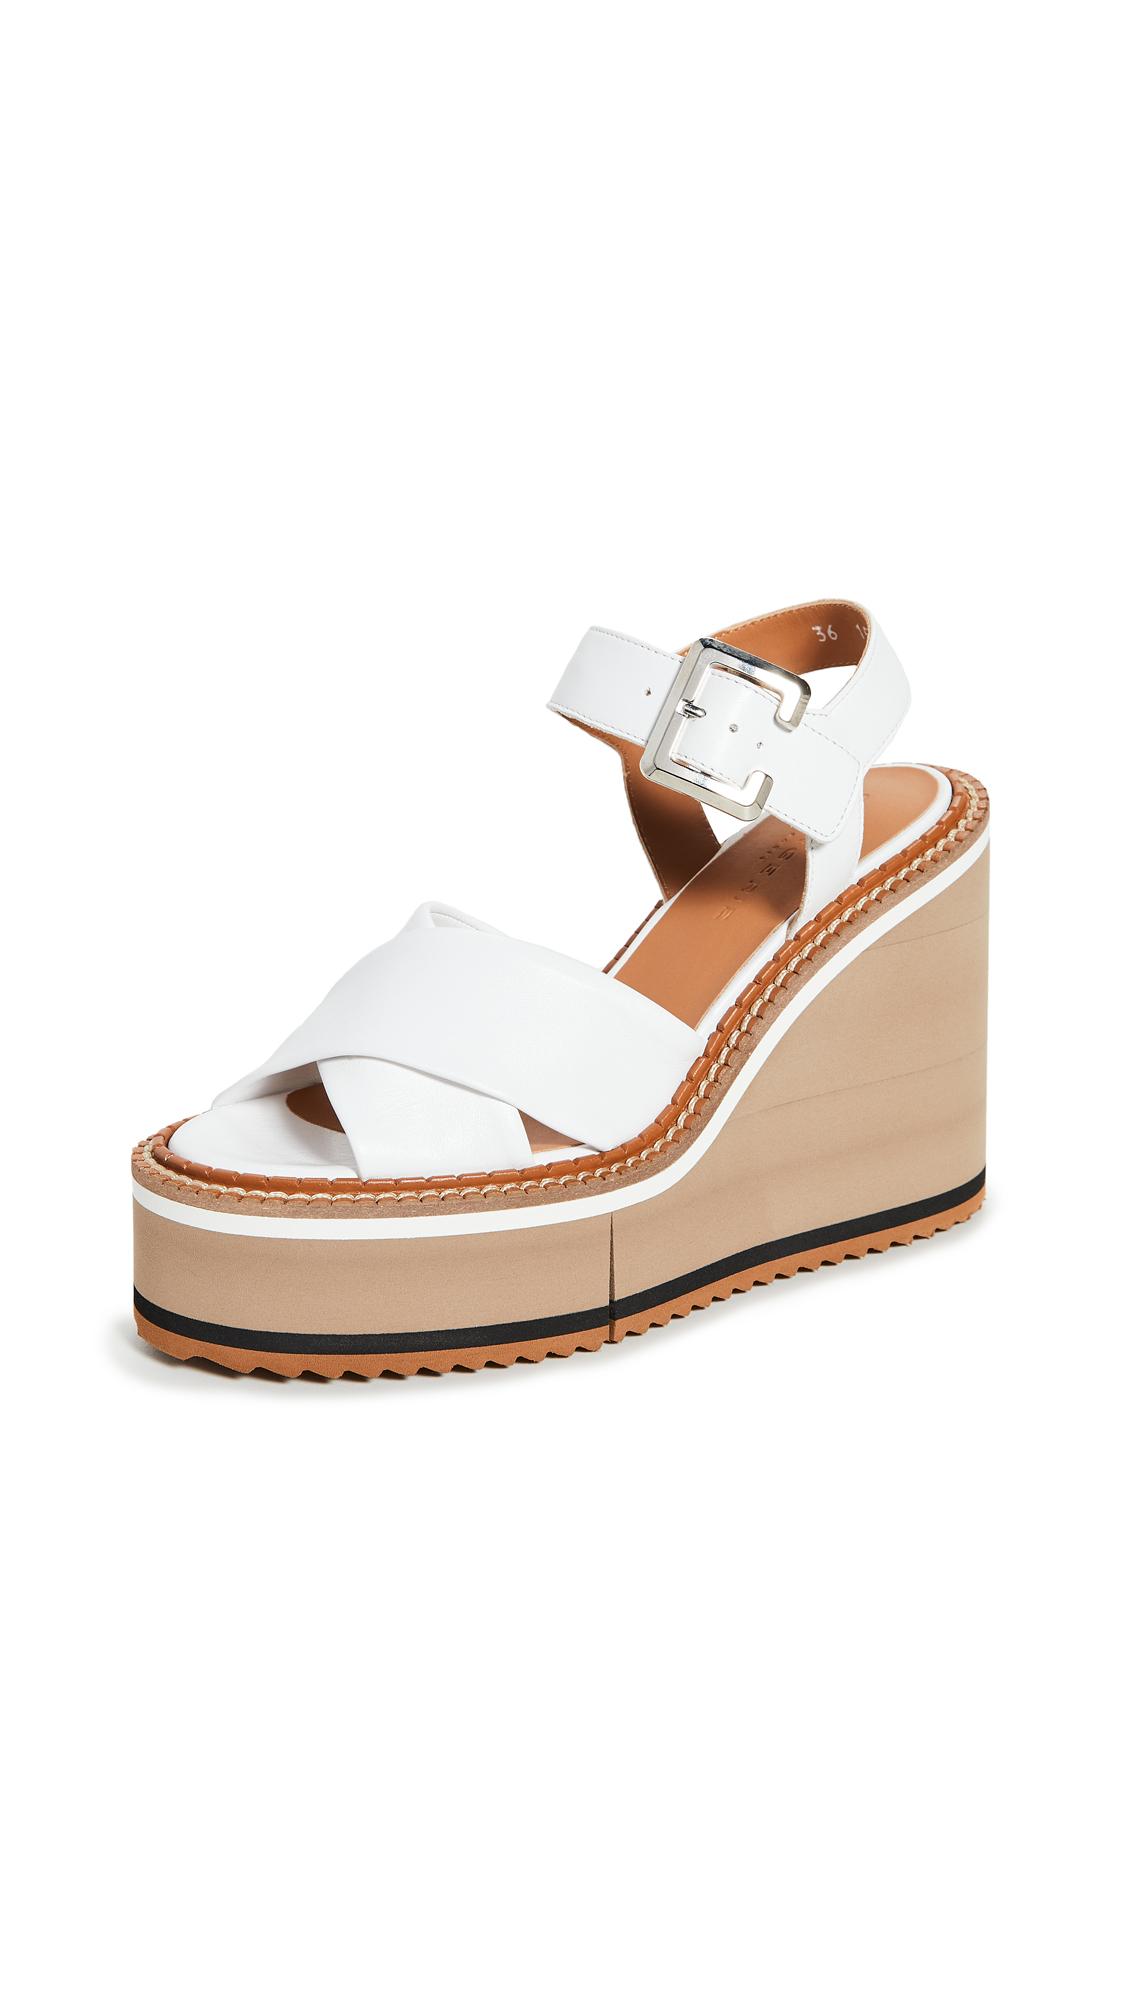 Clergerie Noemie Wedge Sandals - 55% Off Sale